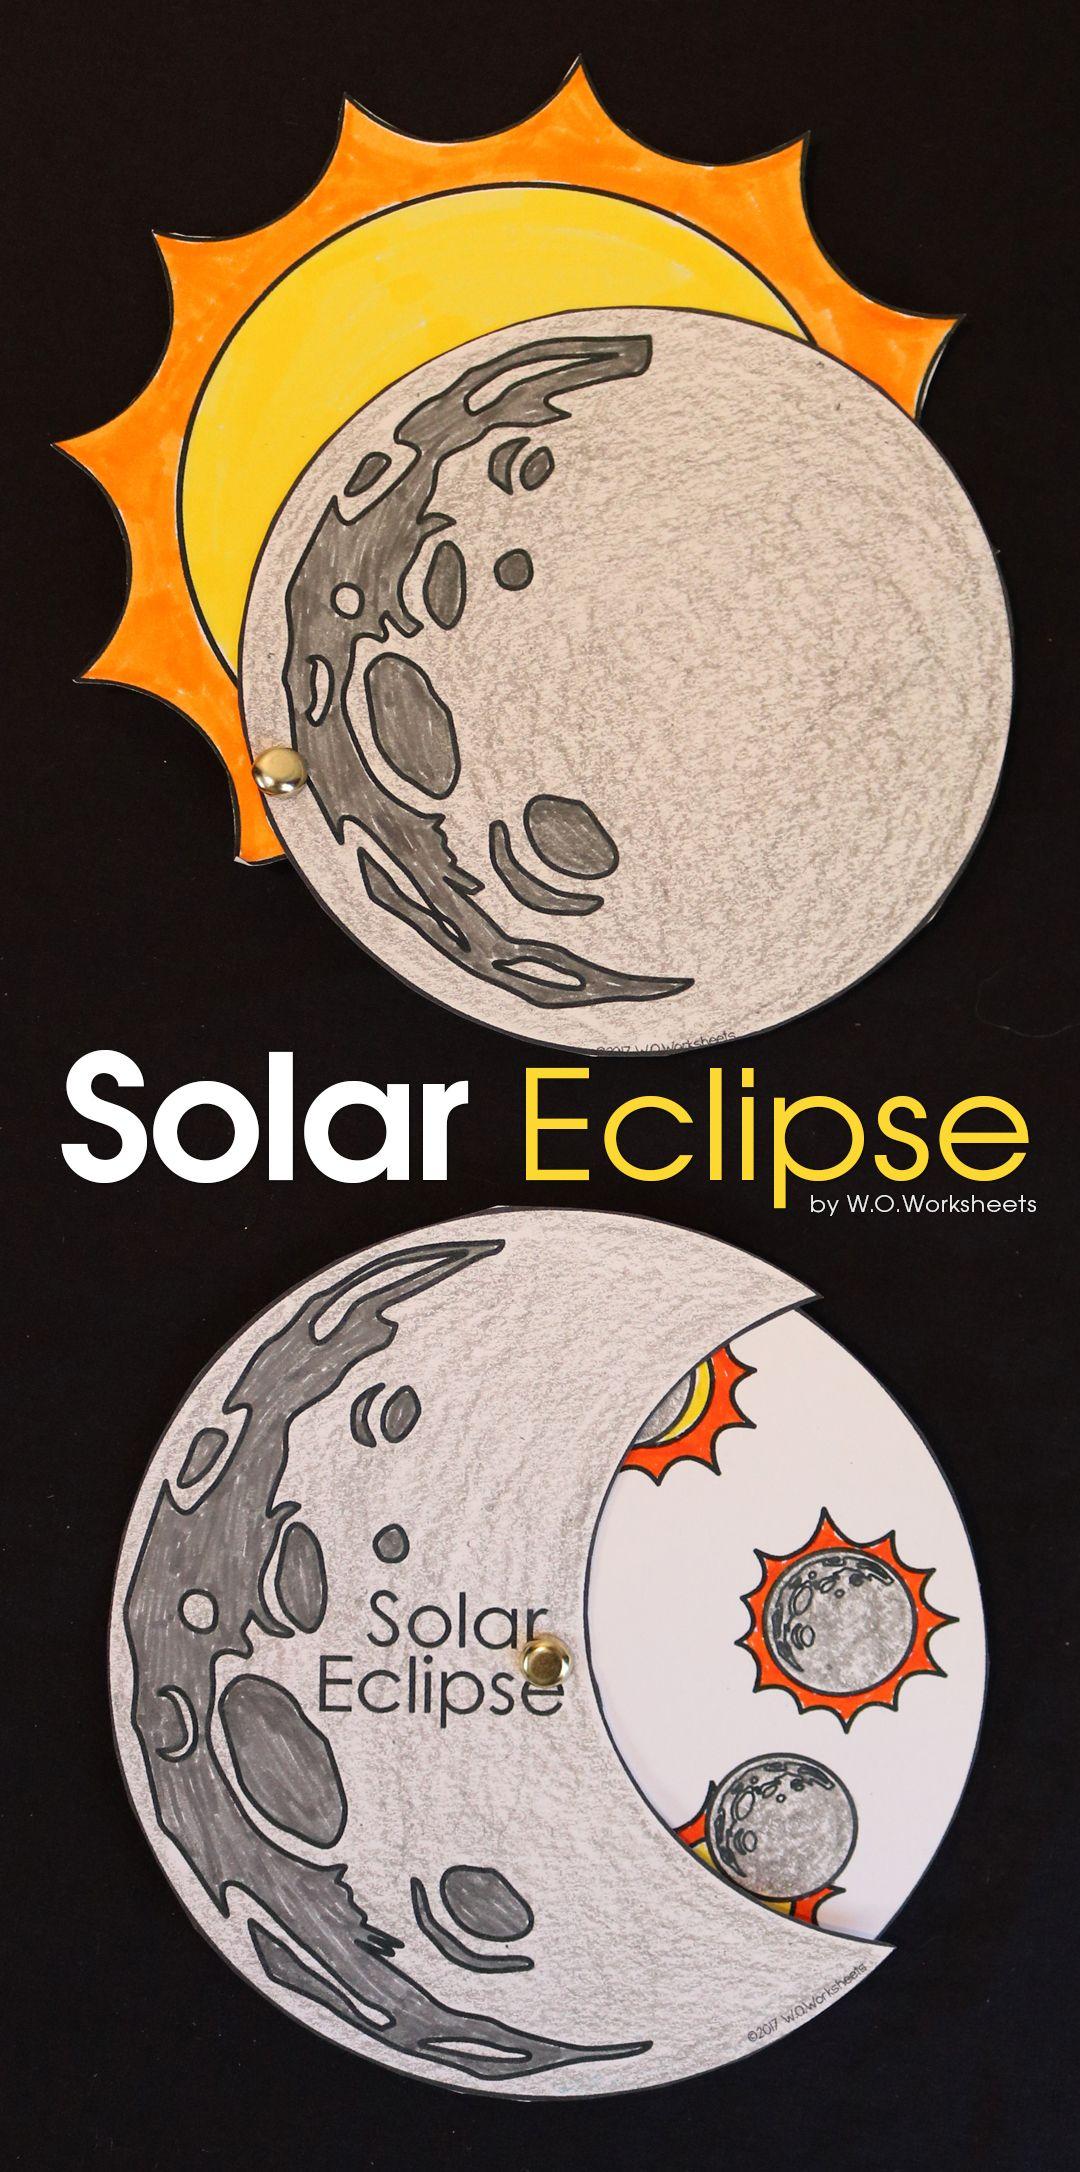 Solar Eclipse Solar Eclipse Solar And Lunar Eclipse Solar Eclipse Facts